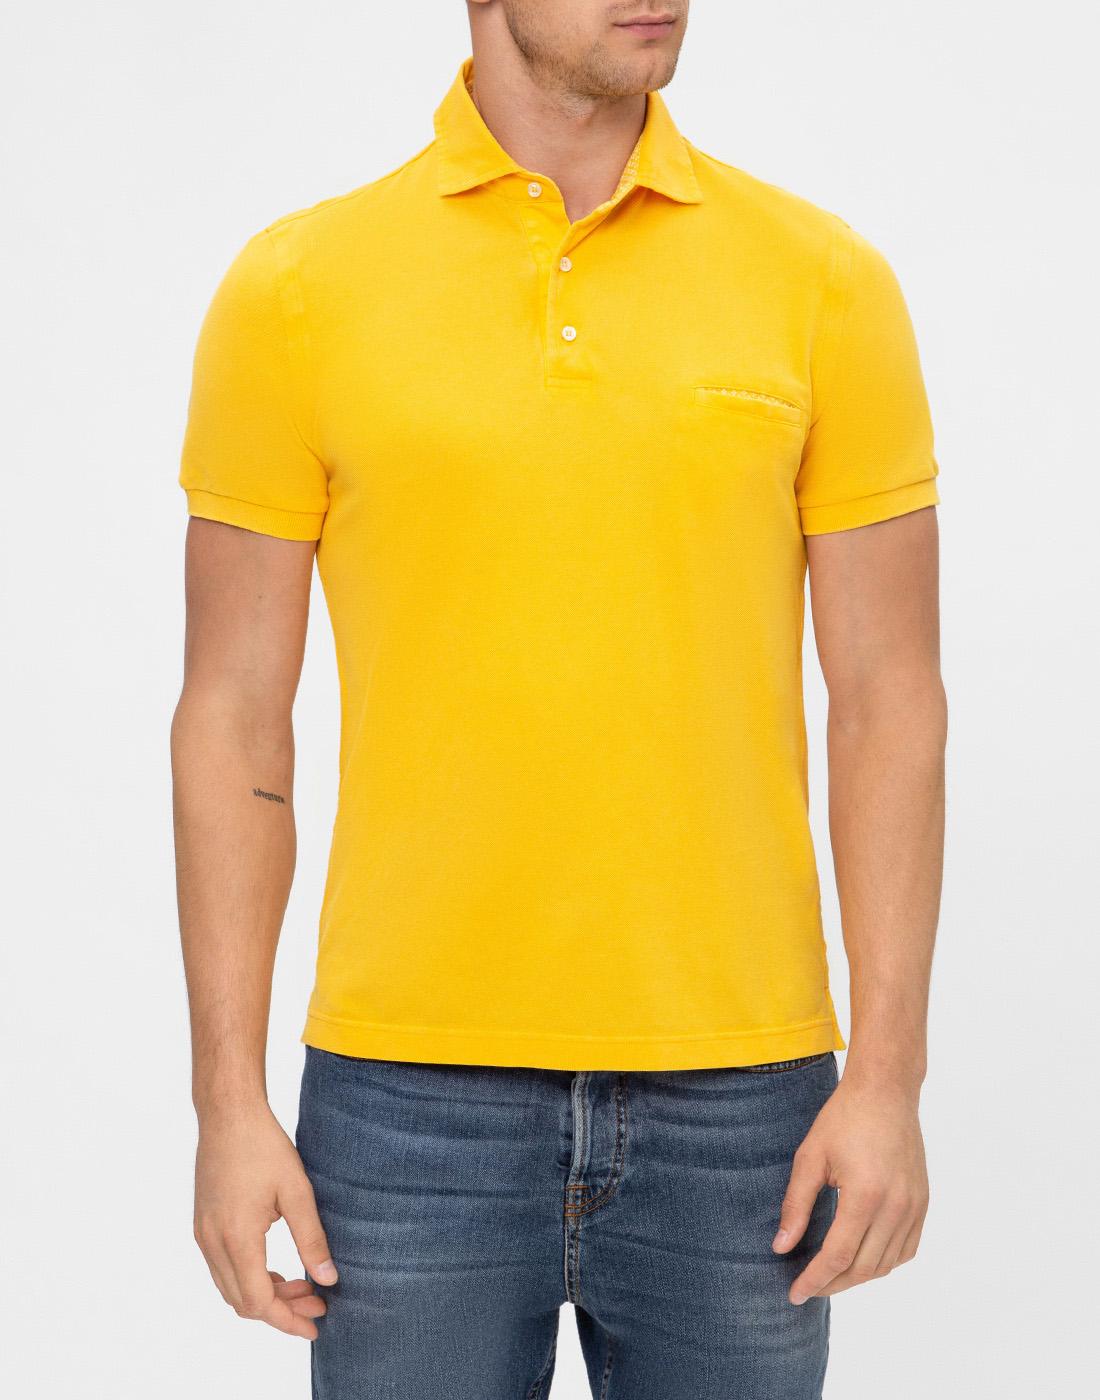 Мужское желтое поло Della Ciana S43305L/37715-2